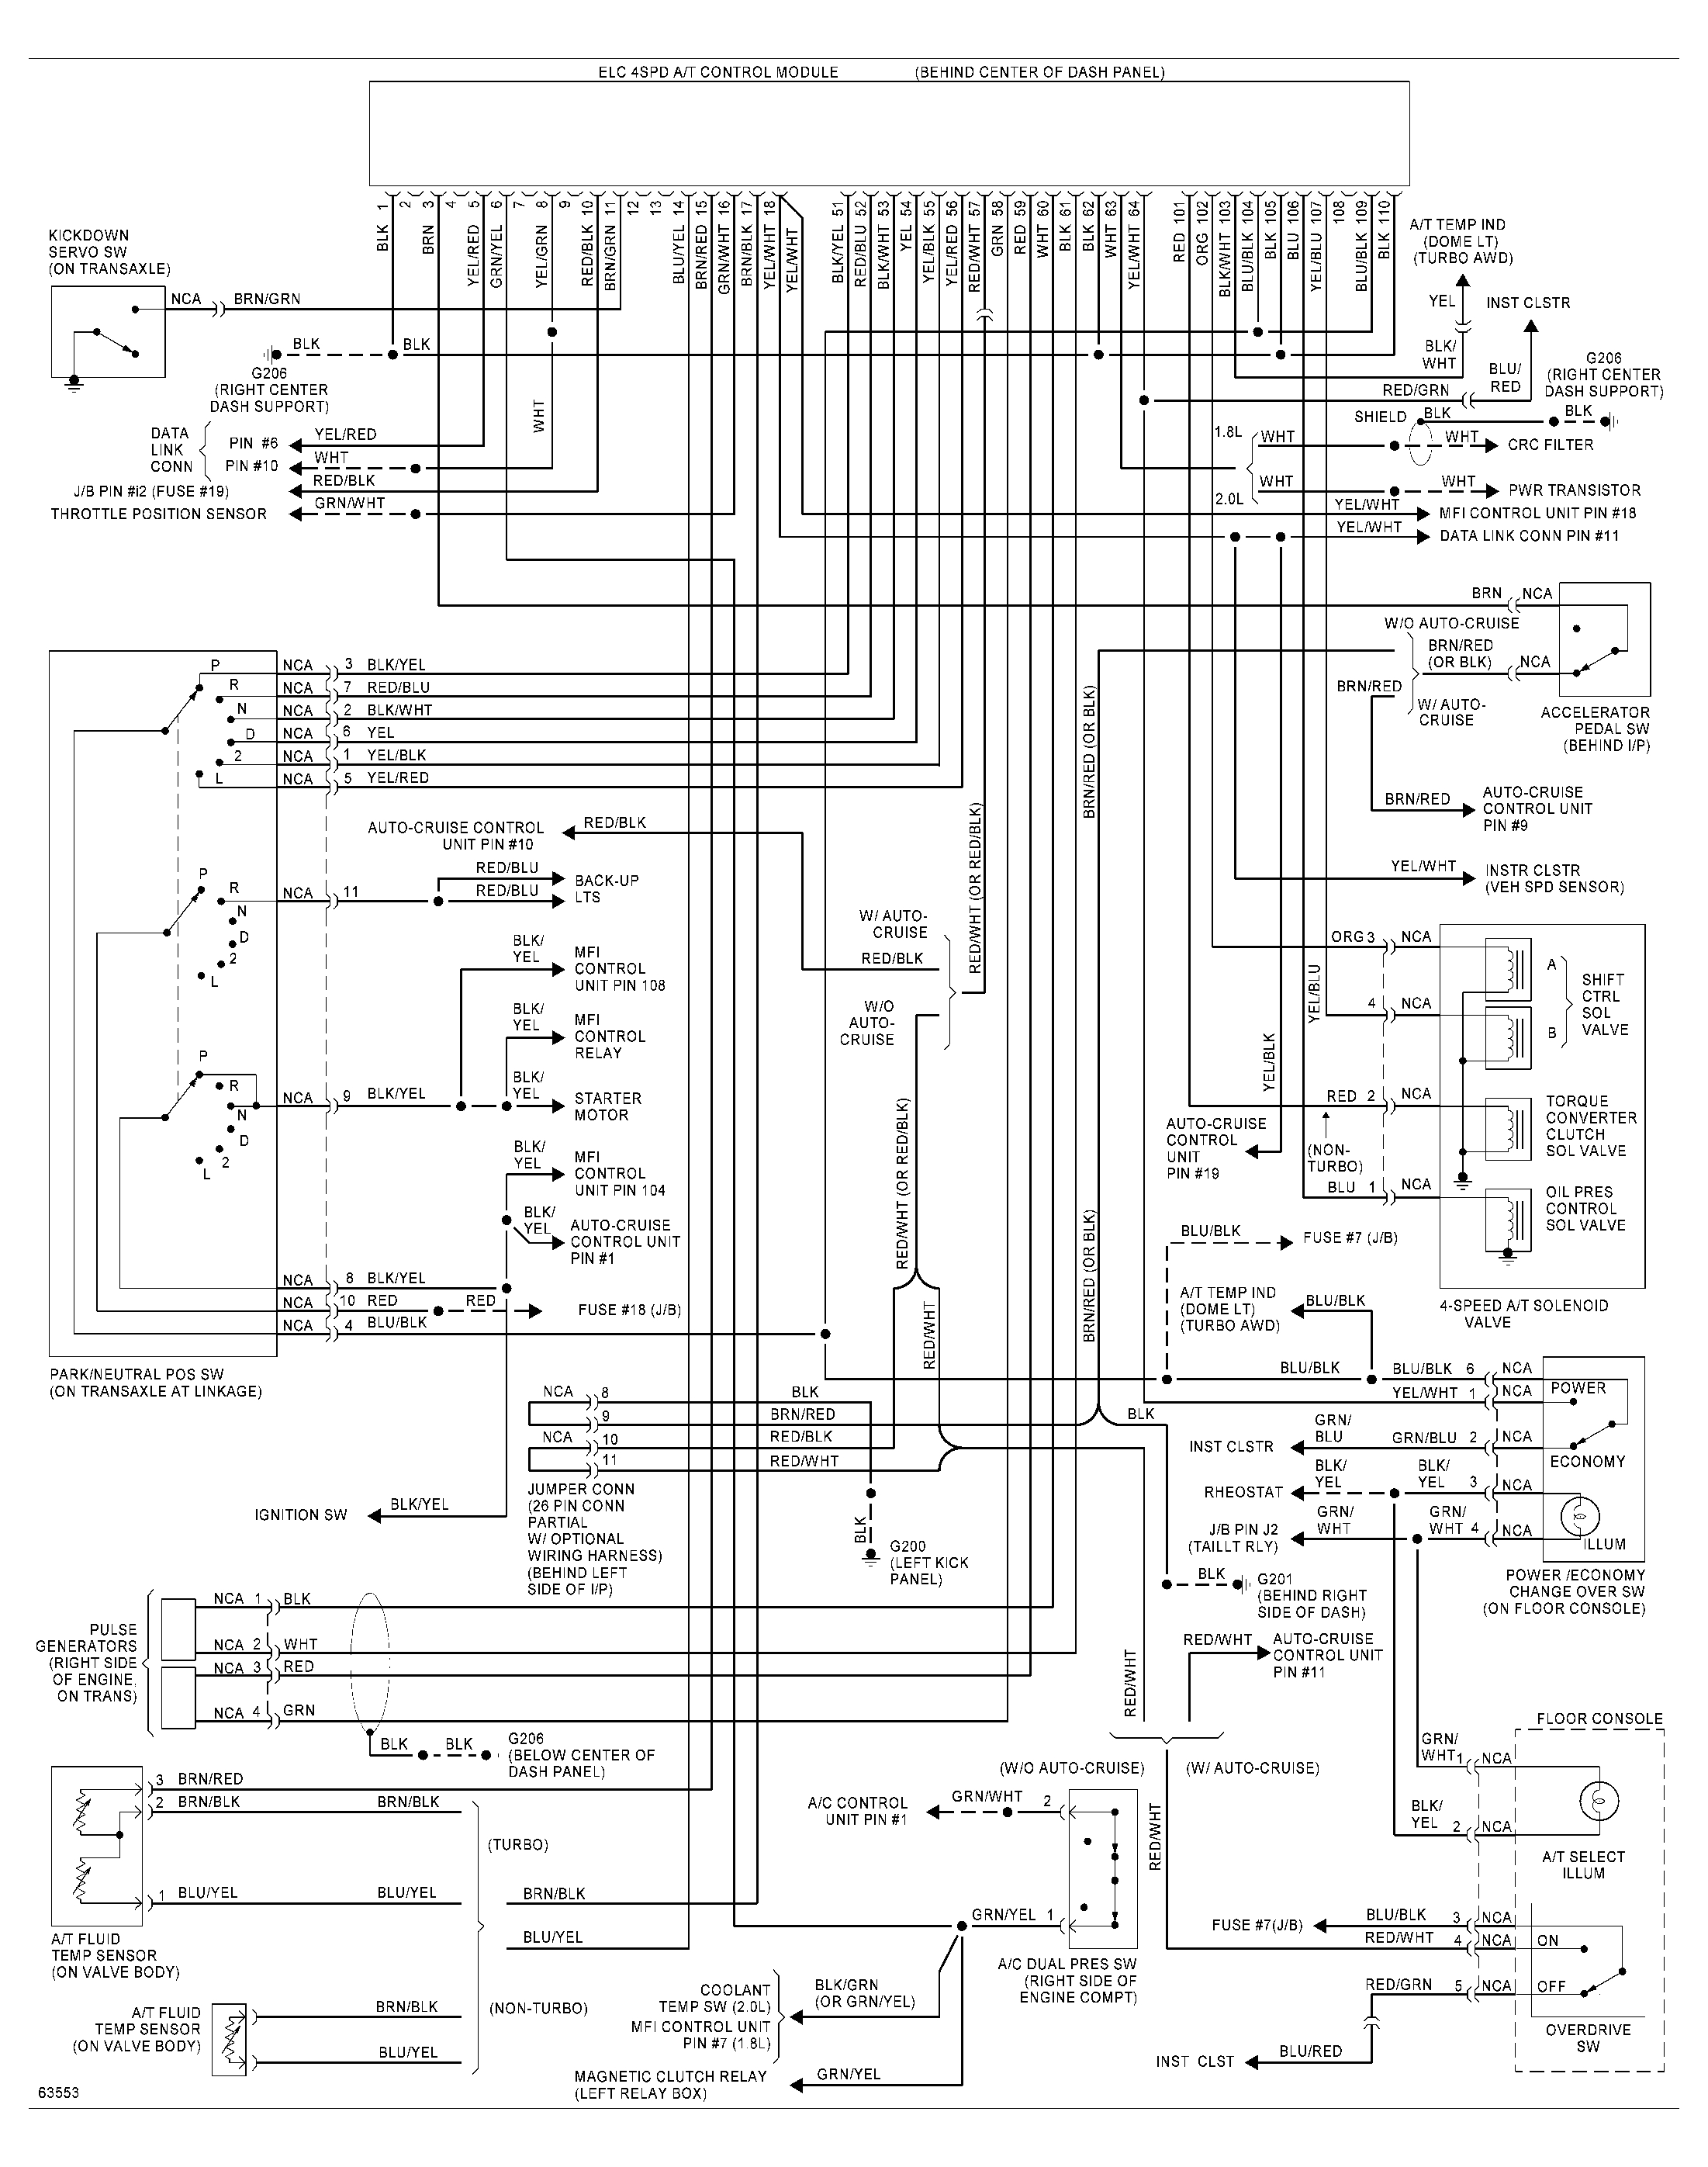 automatic dsm s 93fwd automatic dsm s wiring diagram mitsubishi 4g63 at cita asia